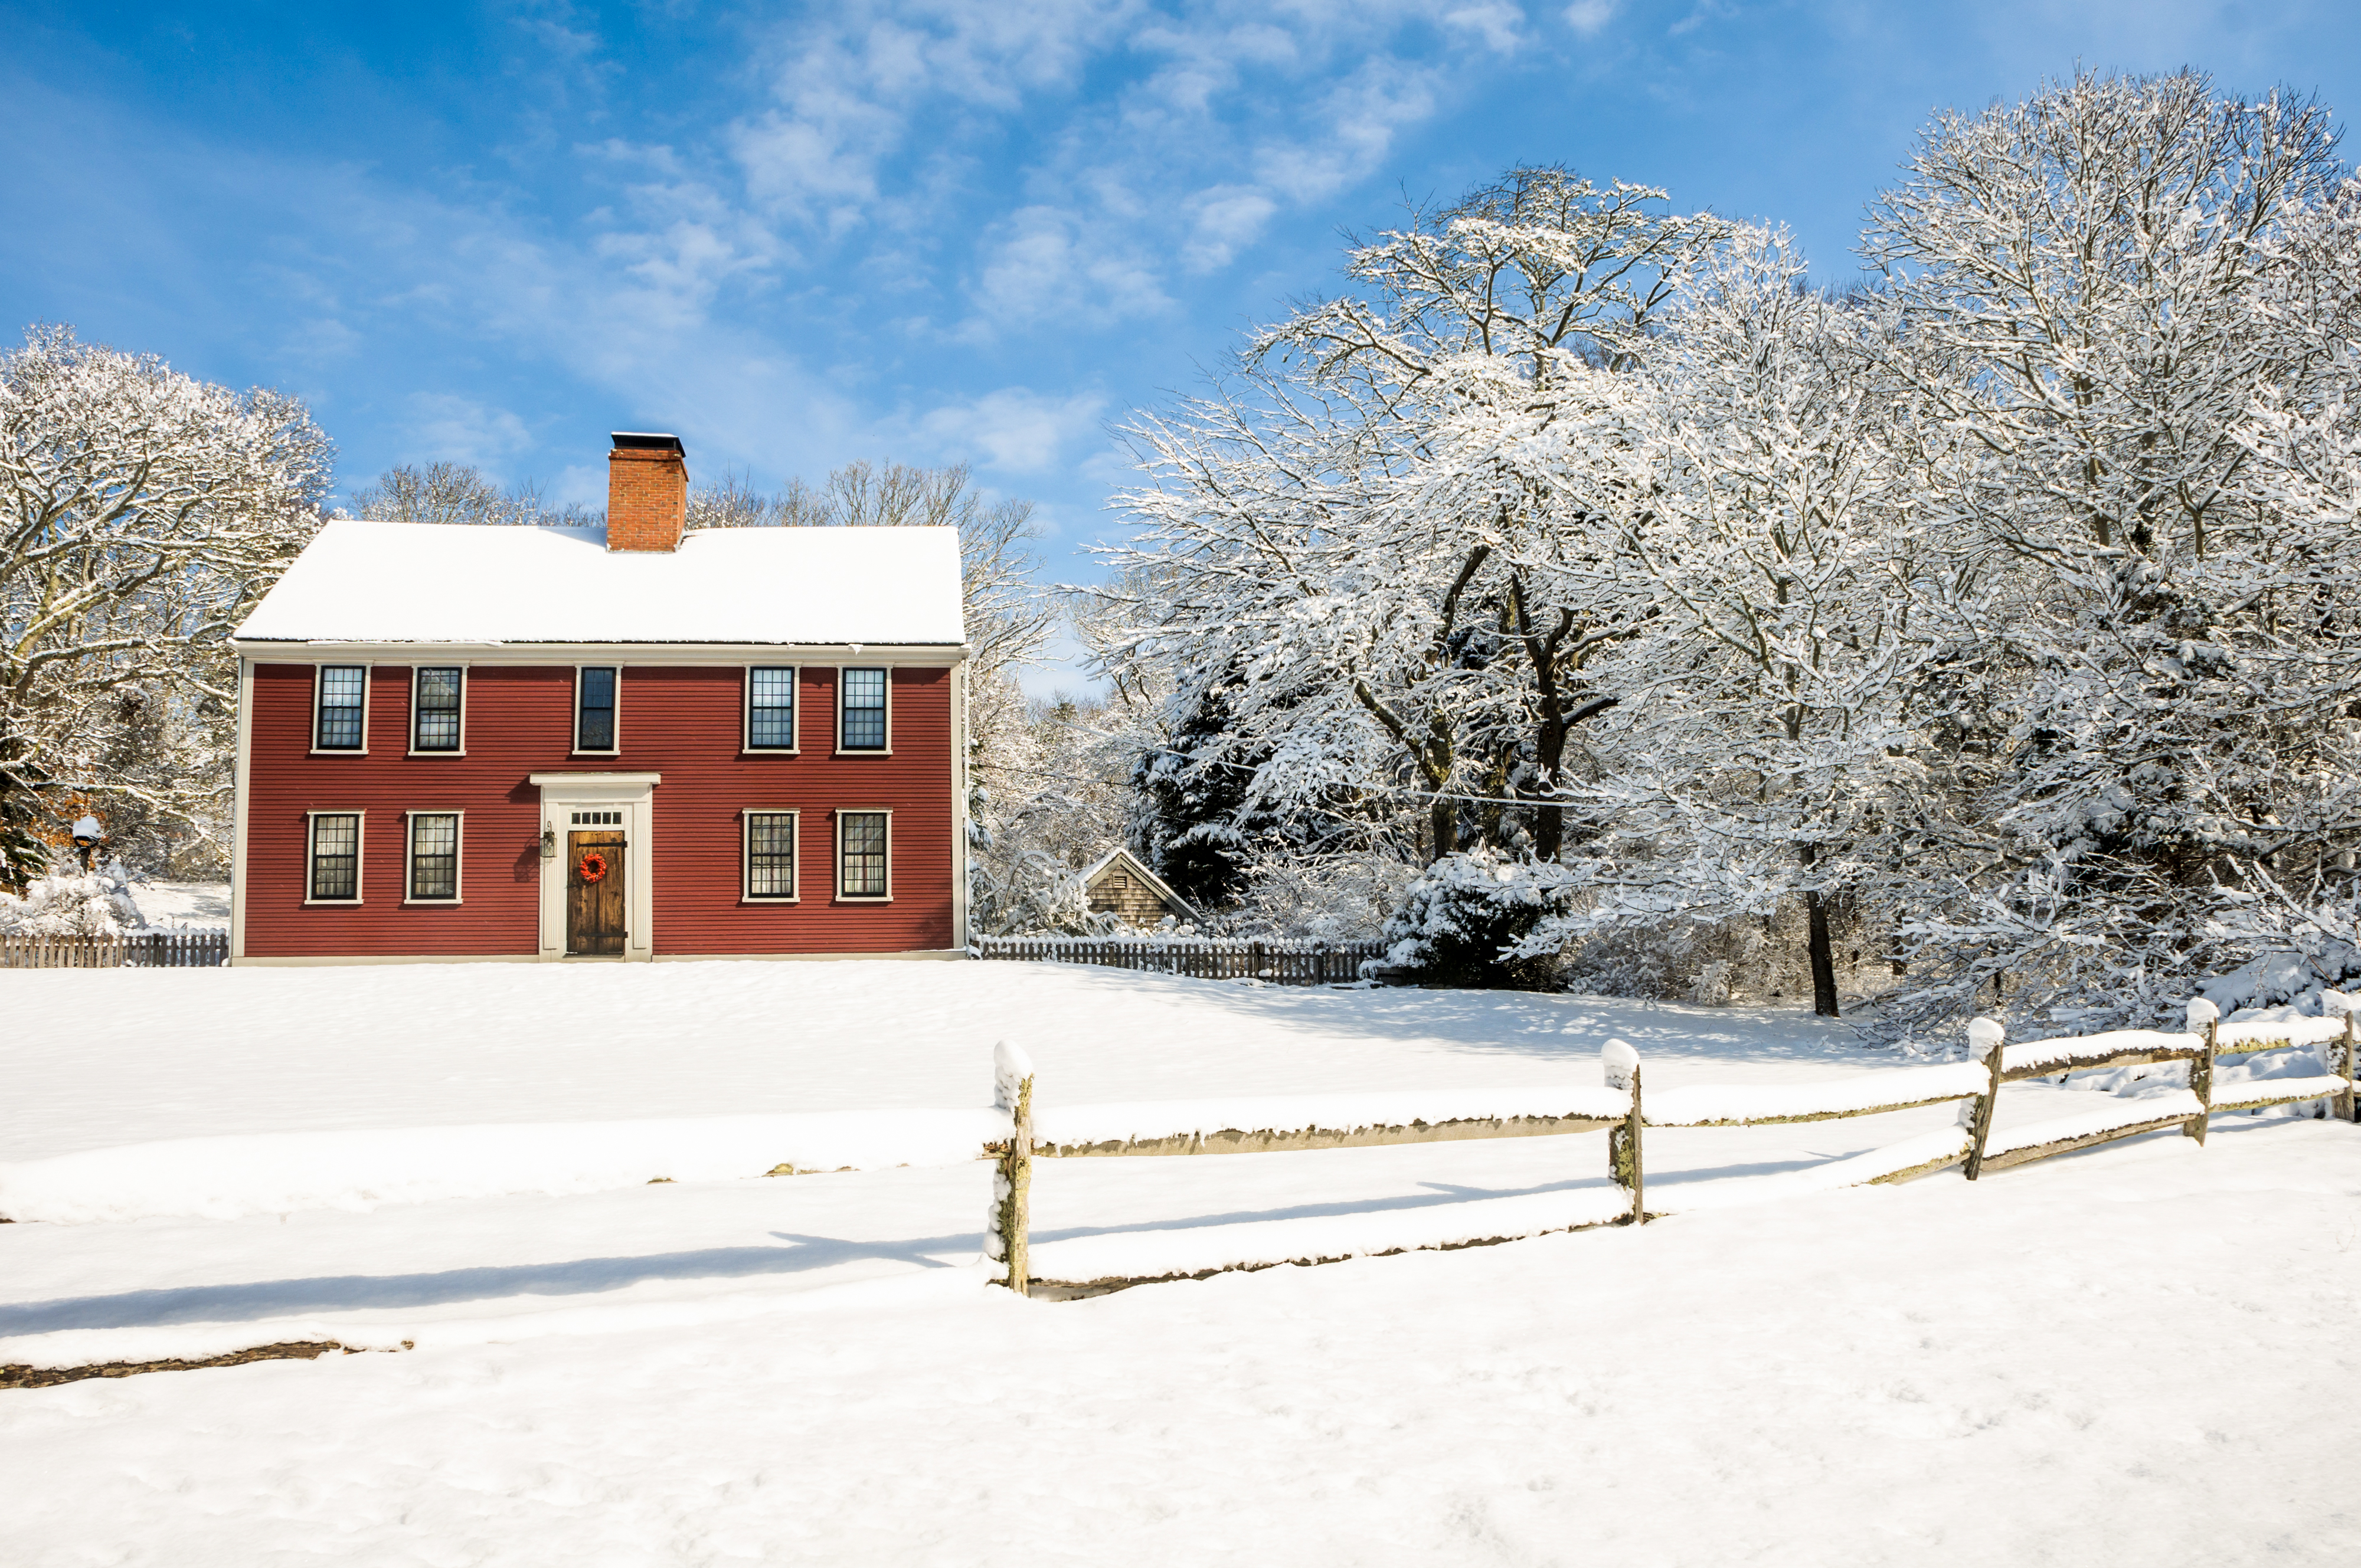 Snowy, Winter, House